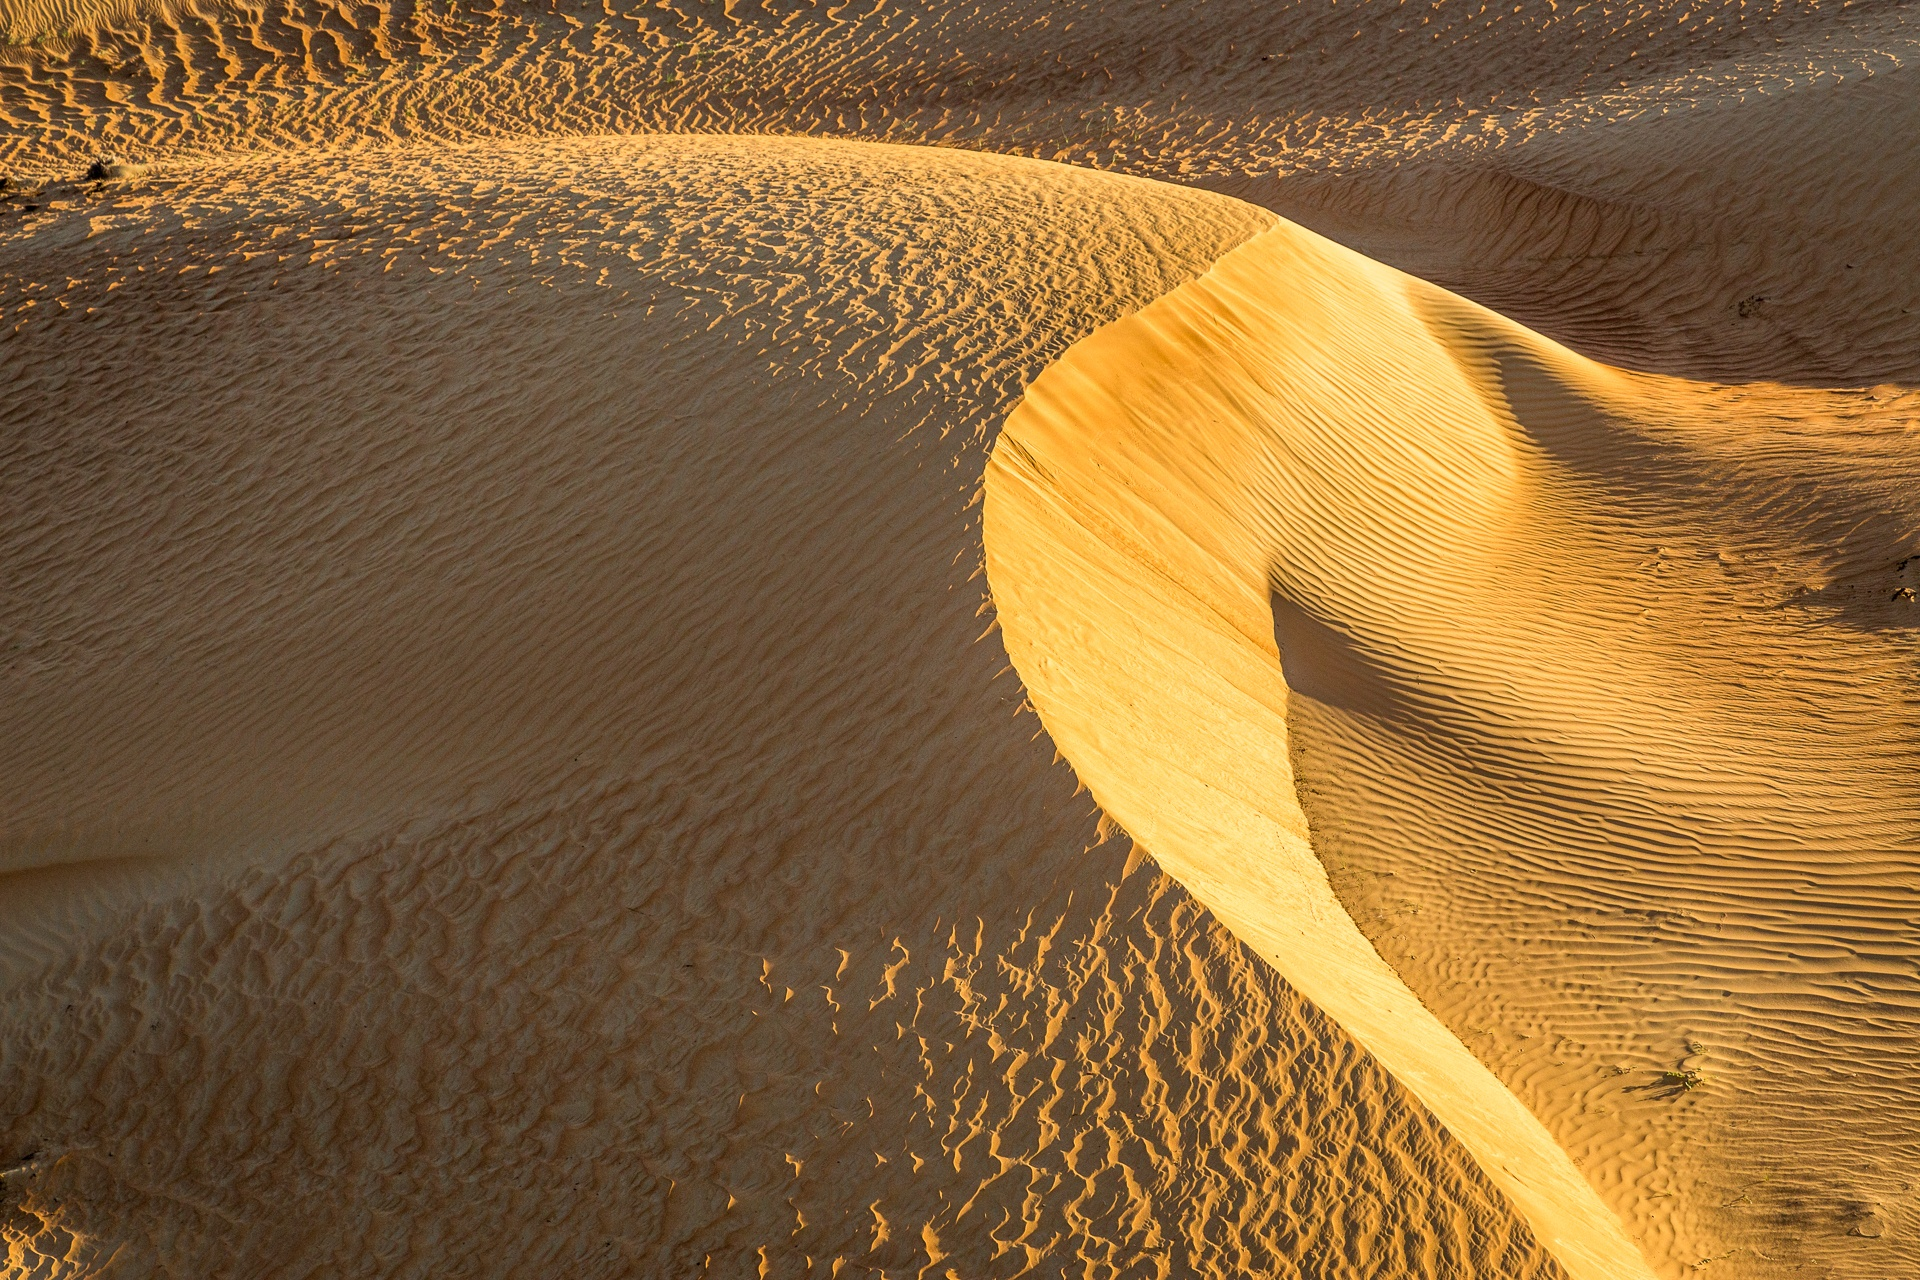 Untouched crescent-shaped sand dune